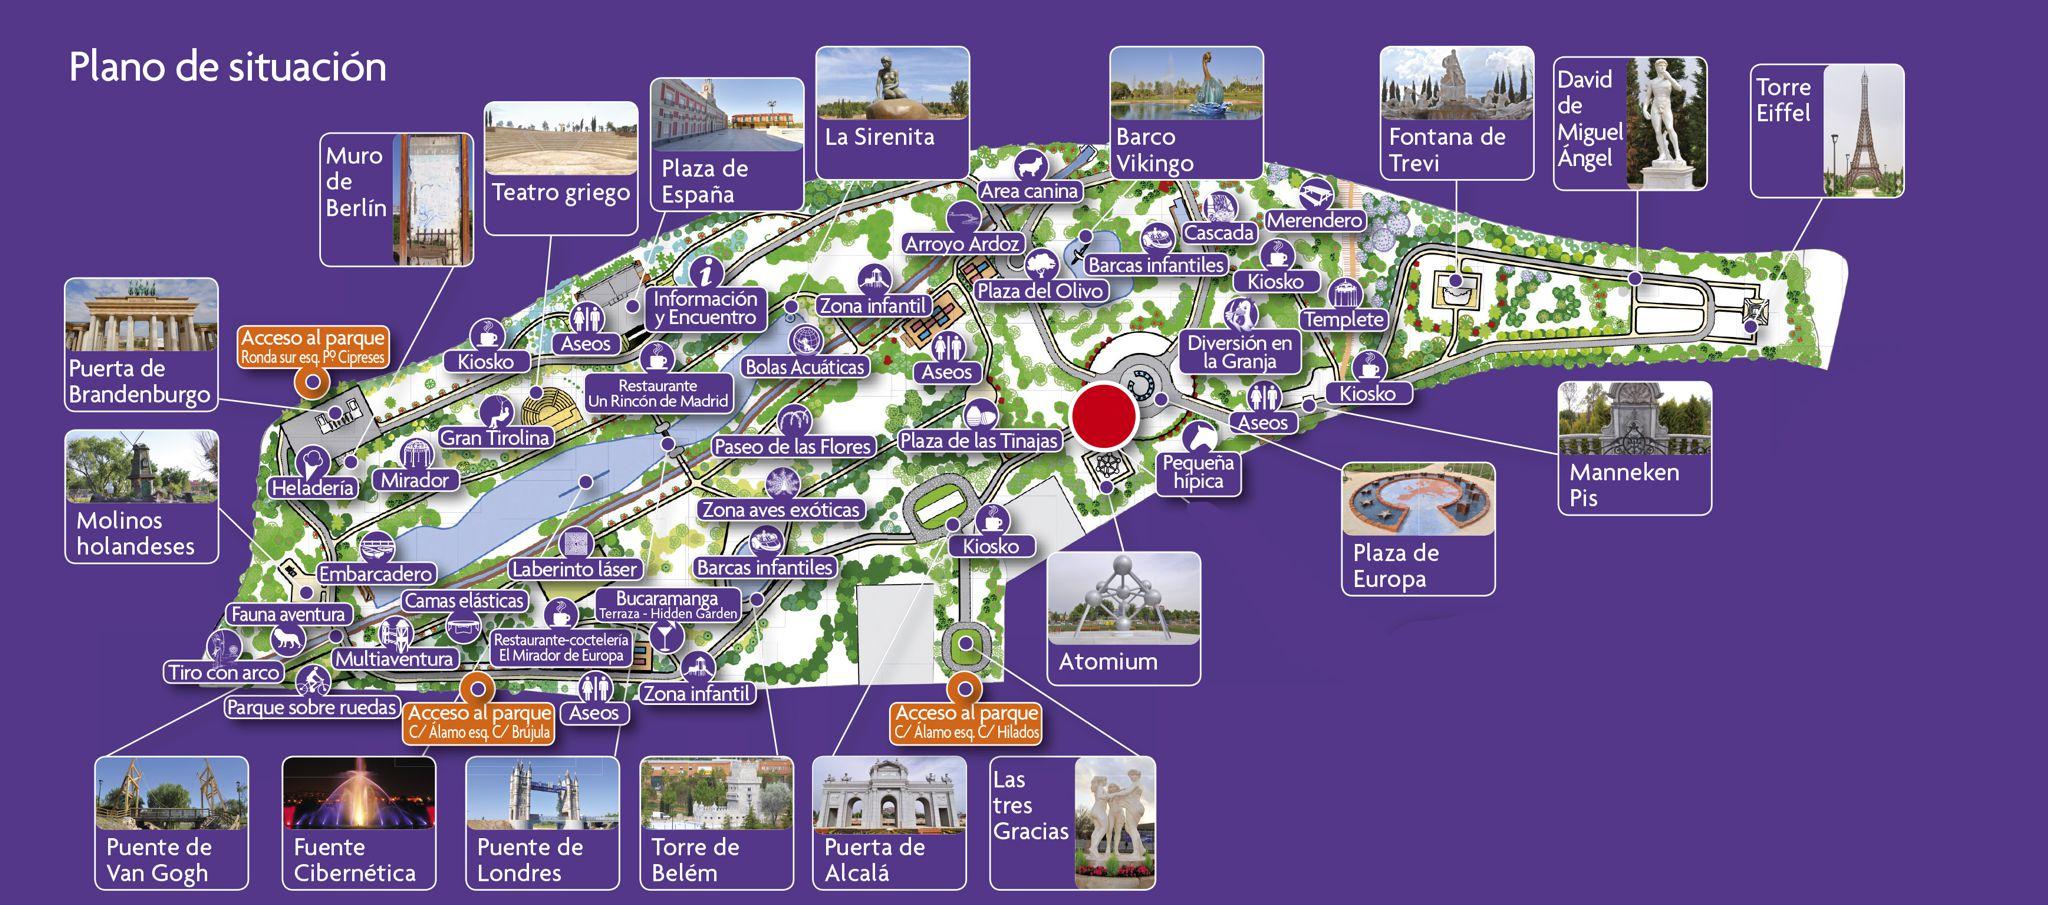 Mapa parque europa my blog for Chalets en torrejon de ardoz